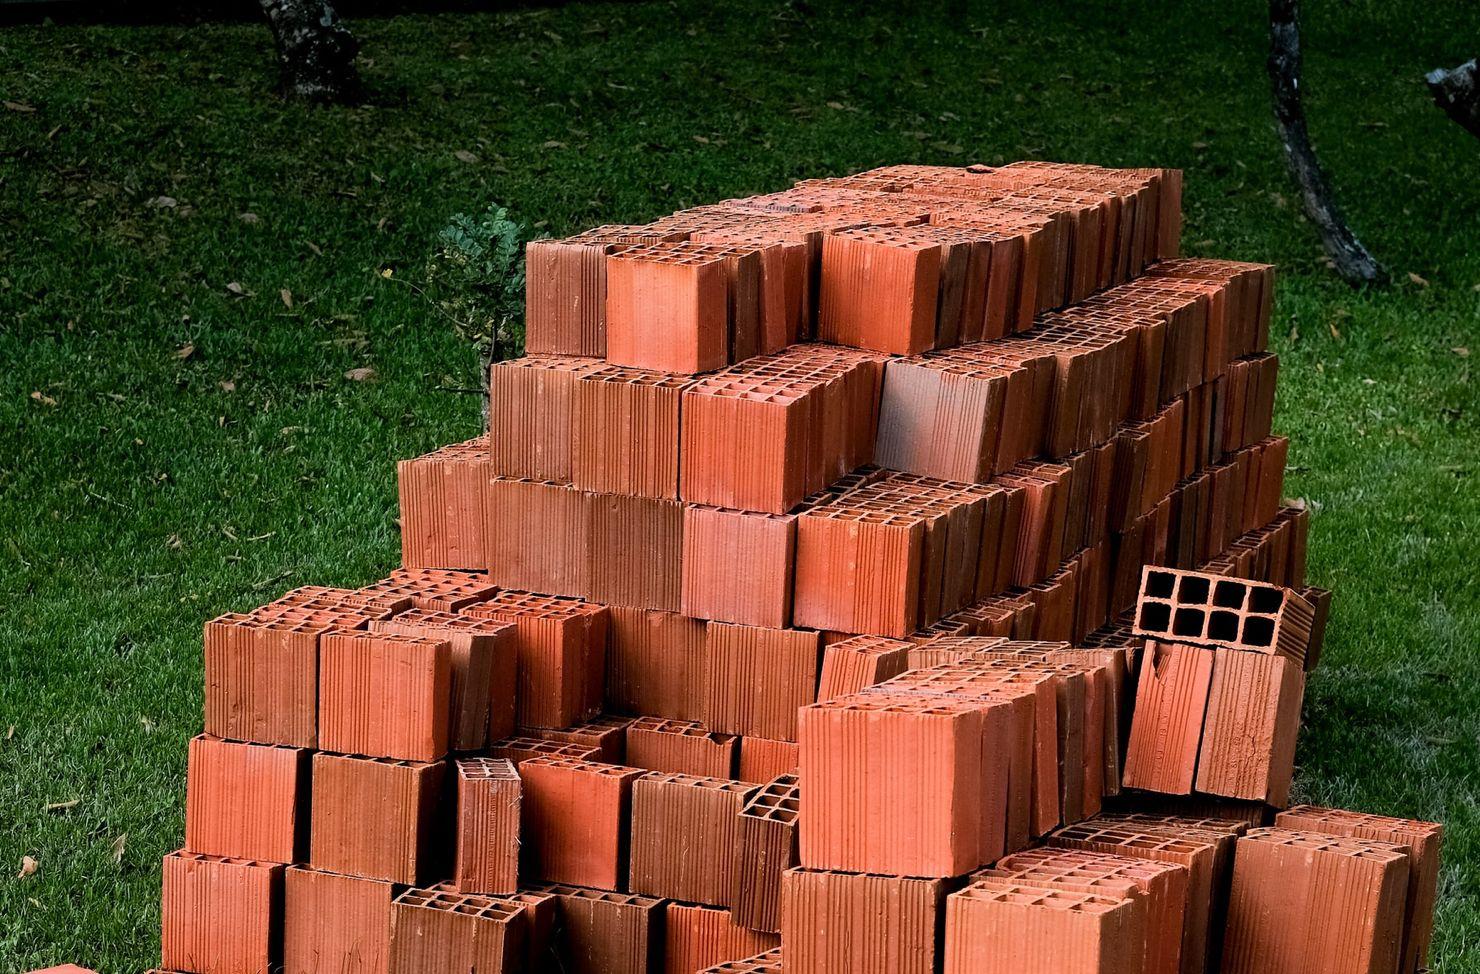 Bricks ready for a mini skip